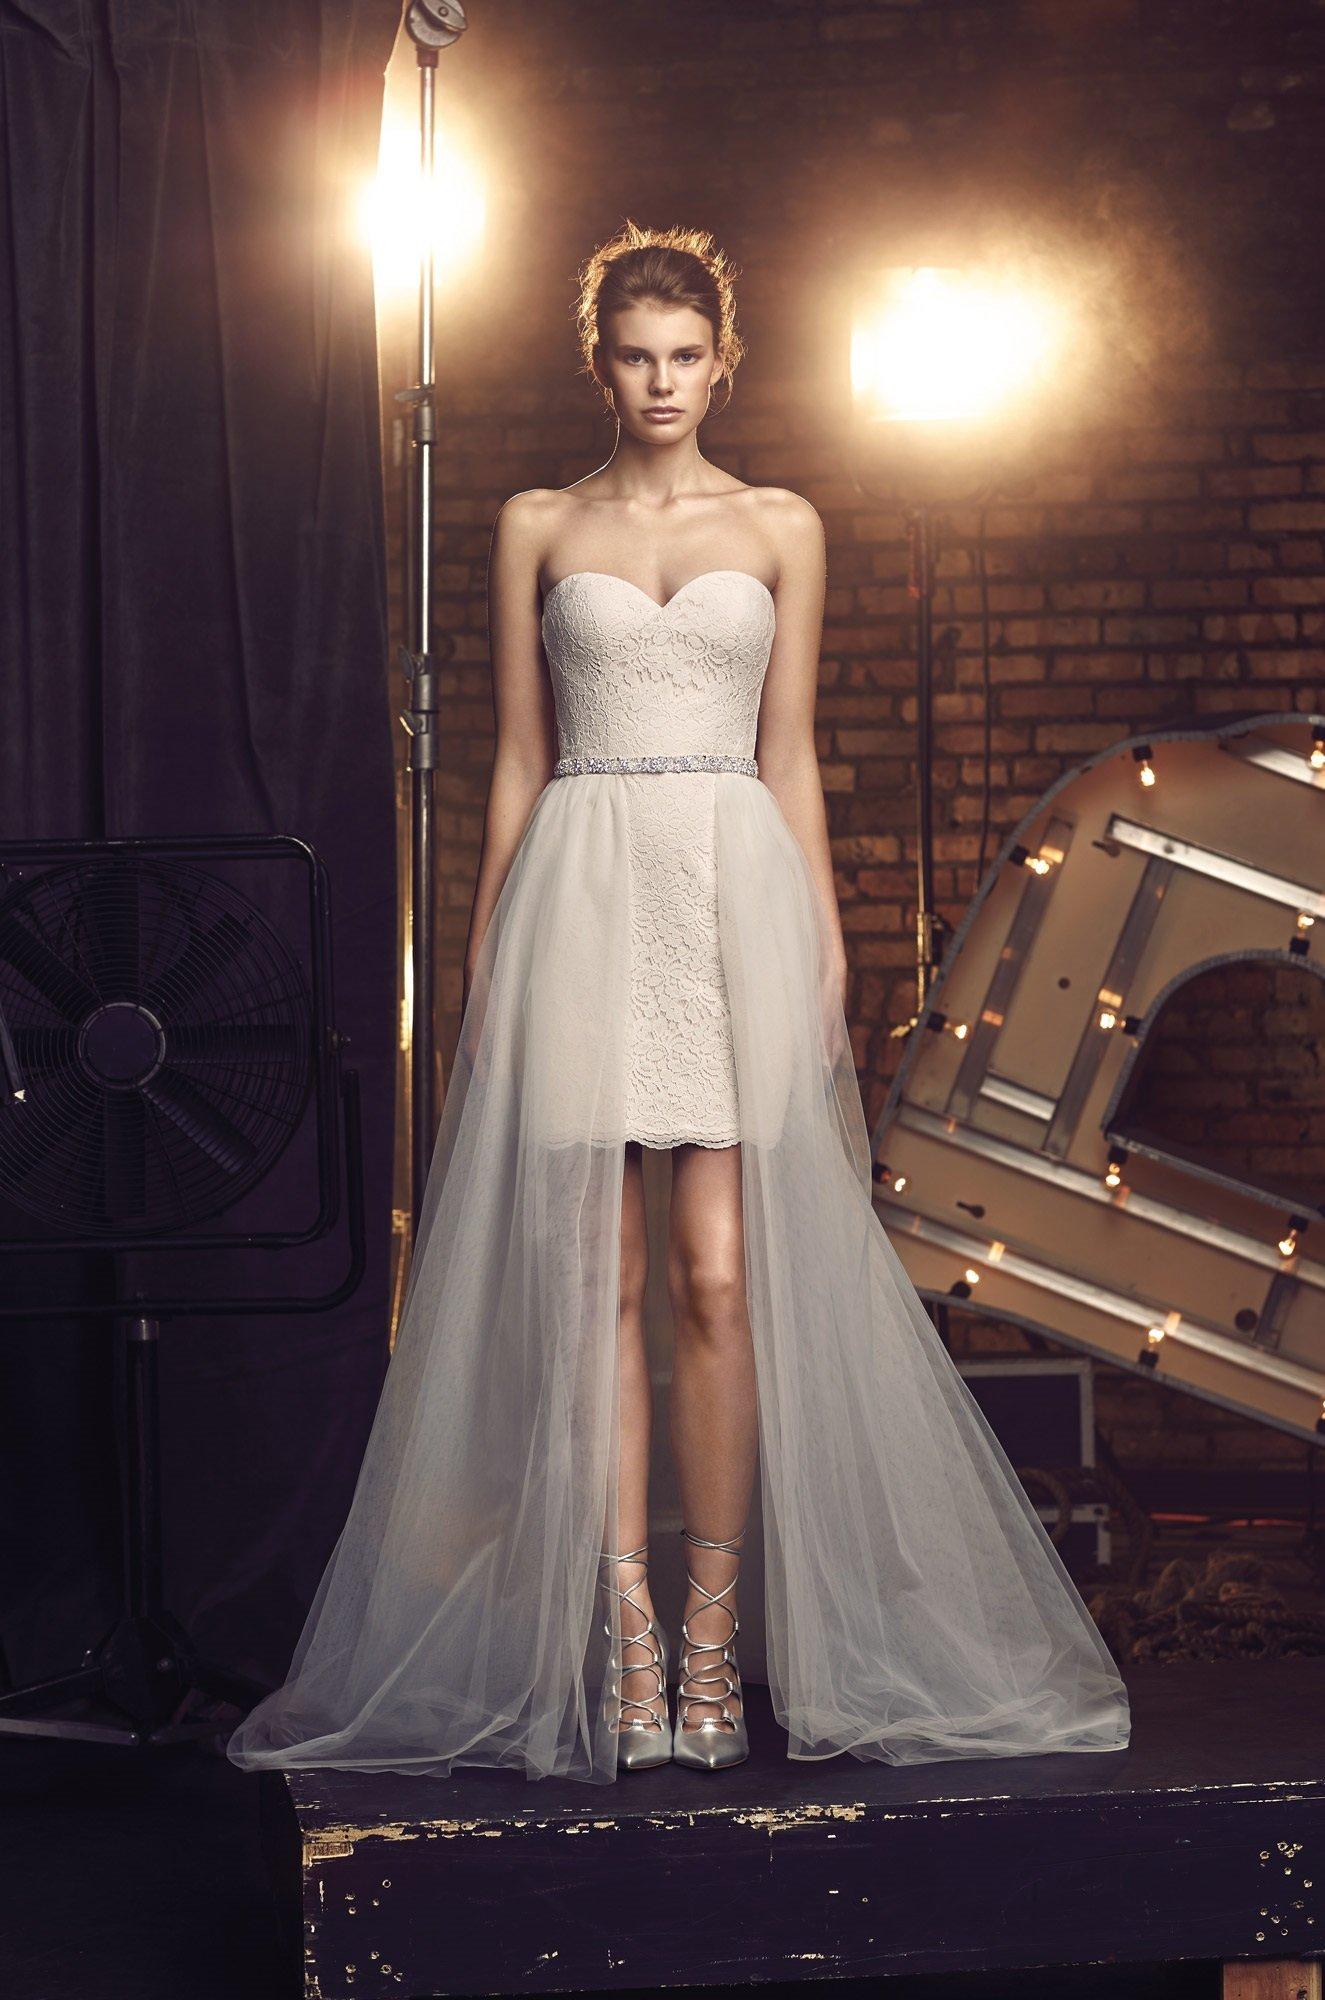 Short Lace Wedding Dress - Style #2076 | Mikaella Bridal